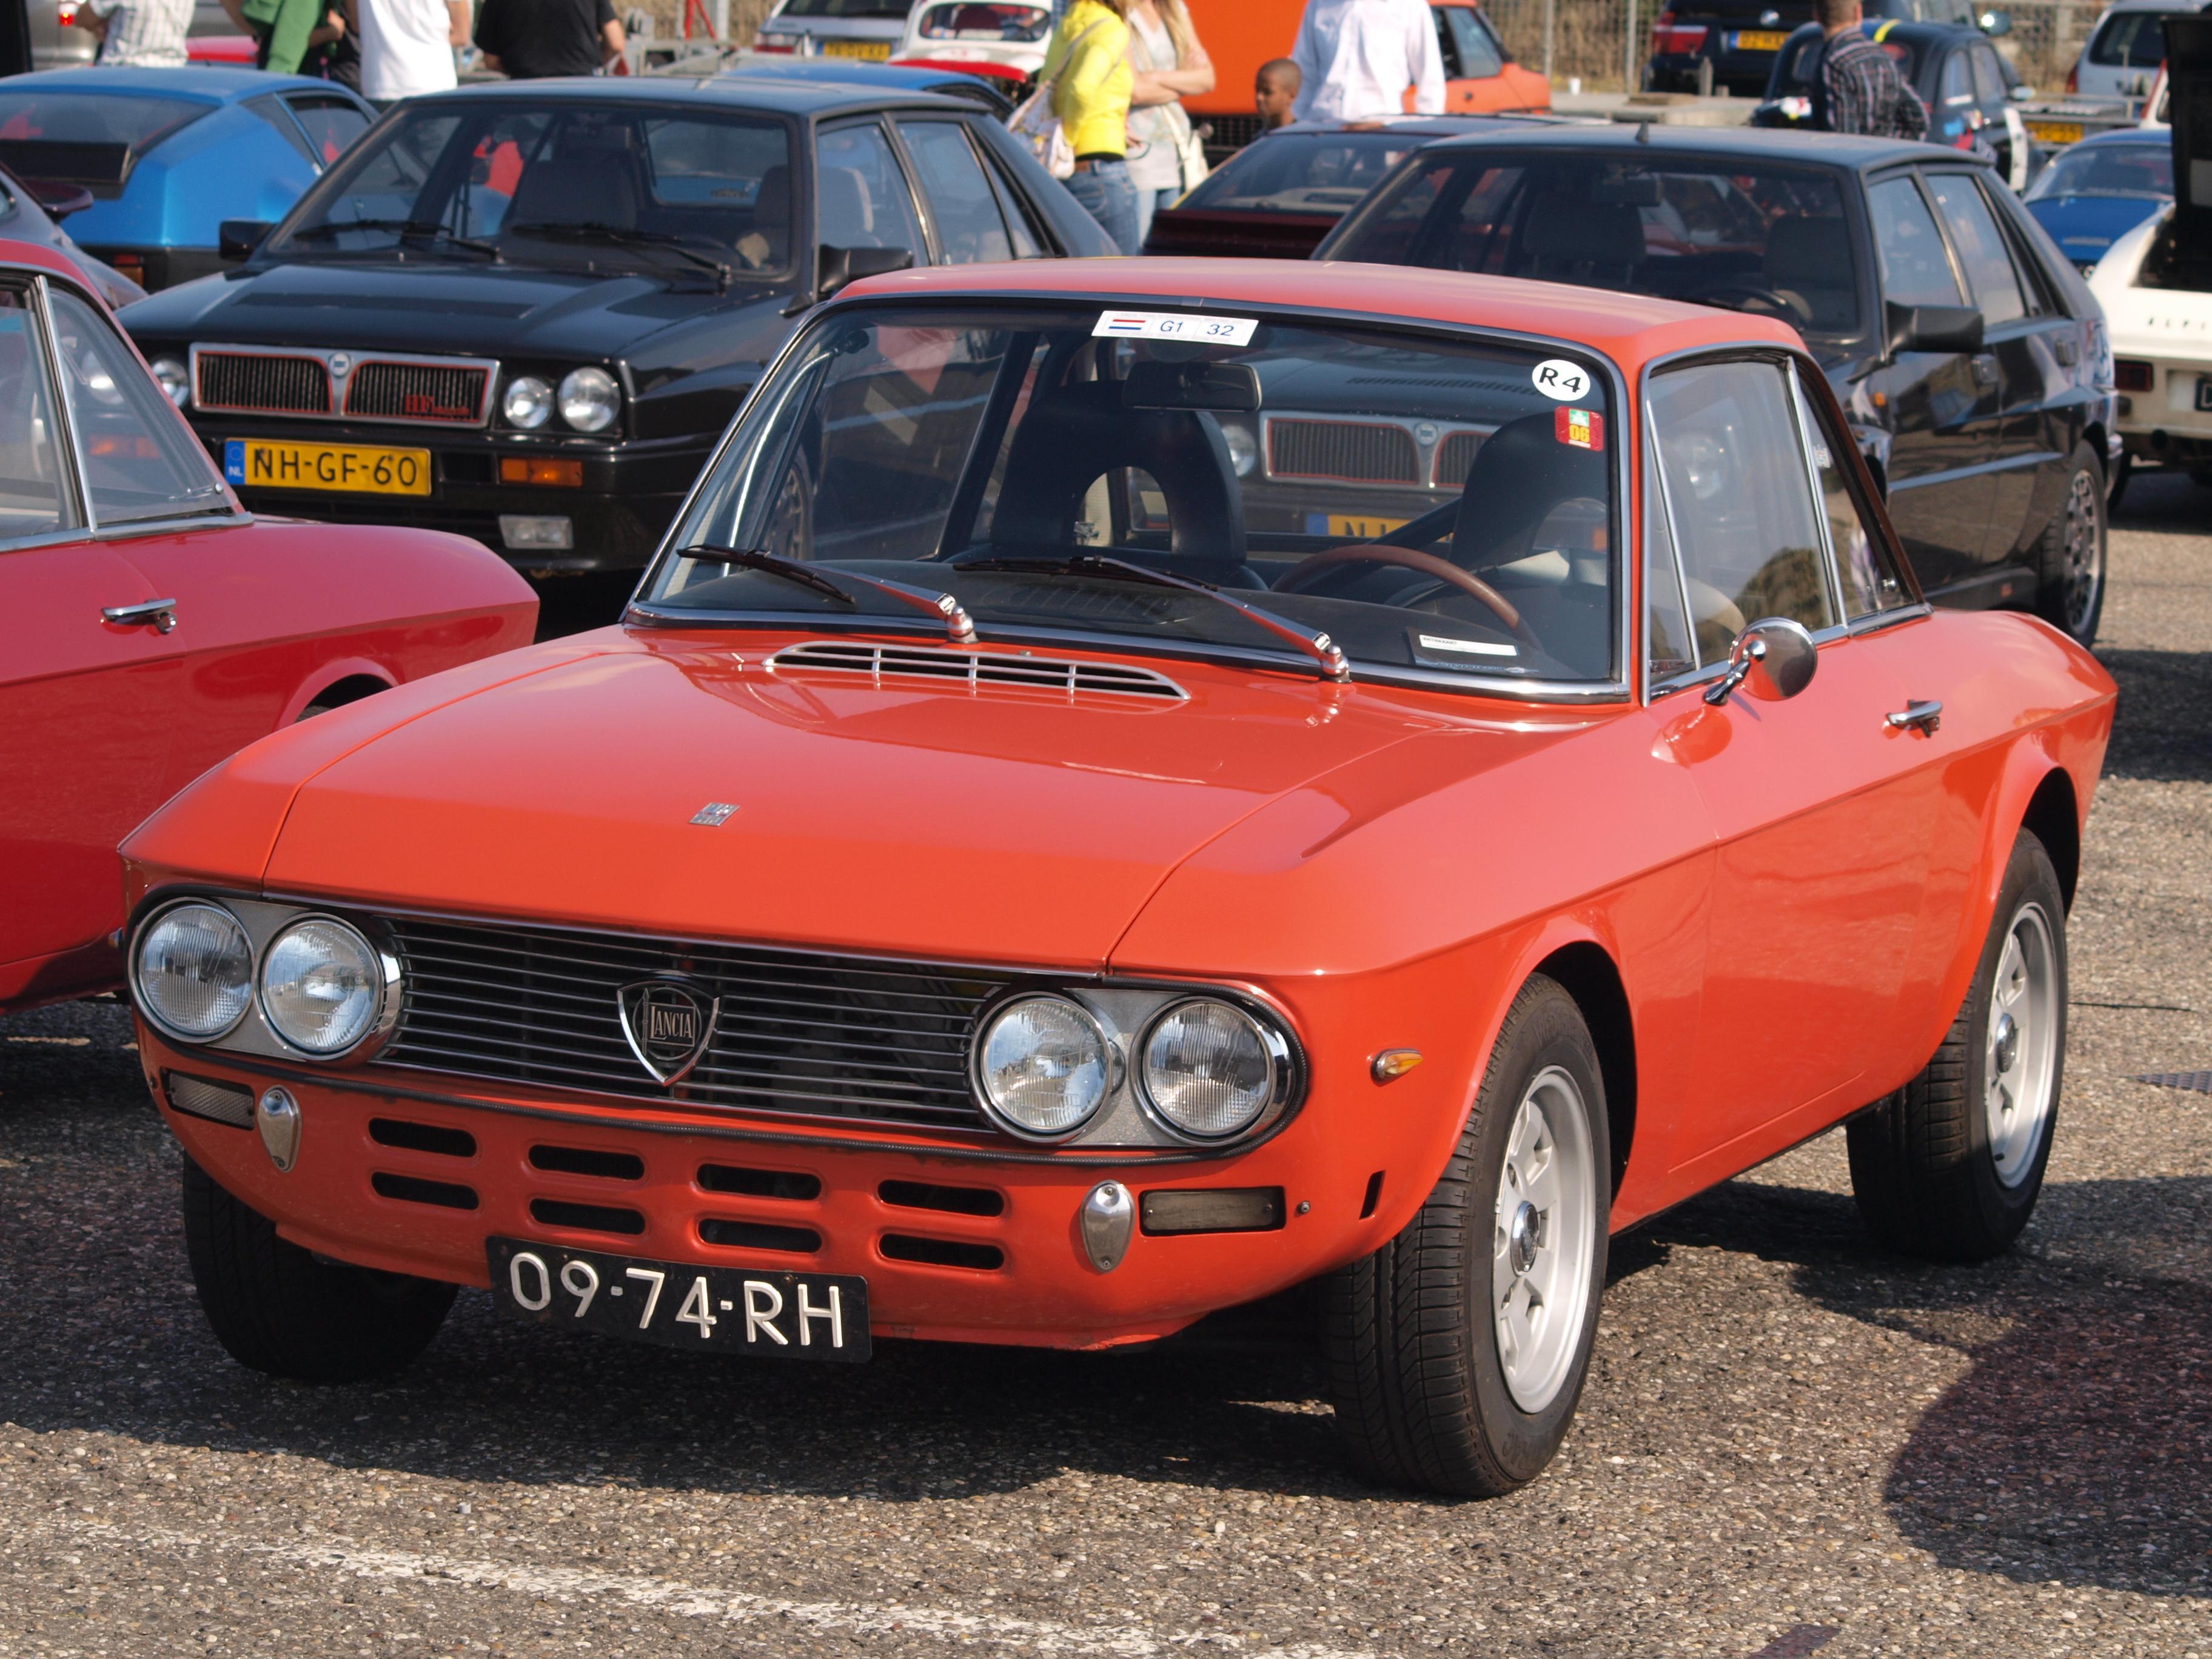 http://upload.wikimedia.org/wikipedia/commons/6/6f/Lancia_Fulvia_Coupe_Rallye_1.6_HF_2nd_Series_dutch_licence_registration_09-74-RH_pic1.JPG